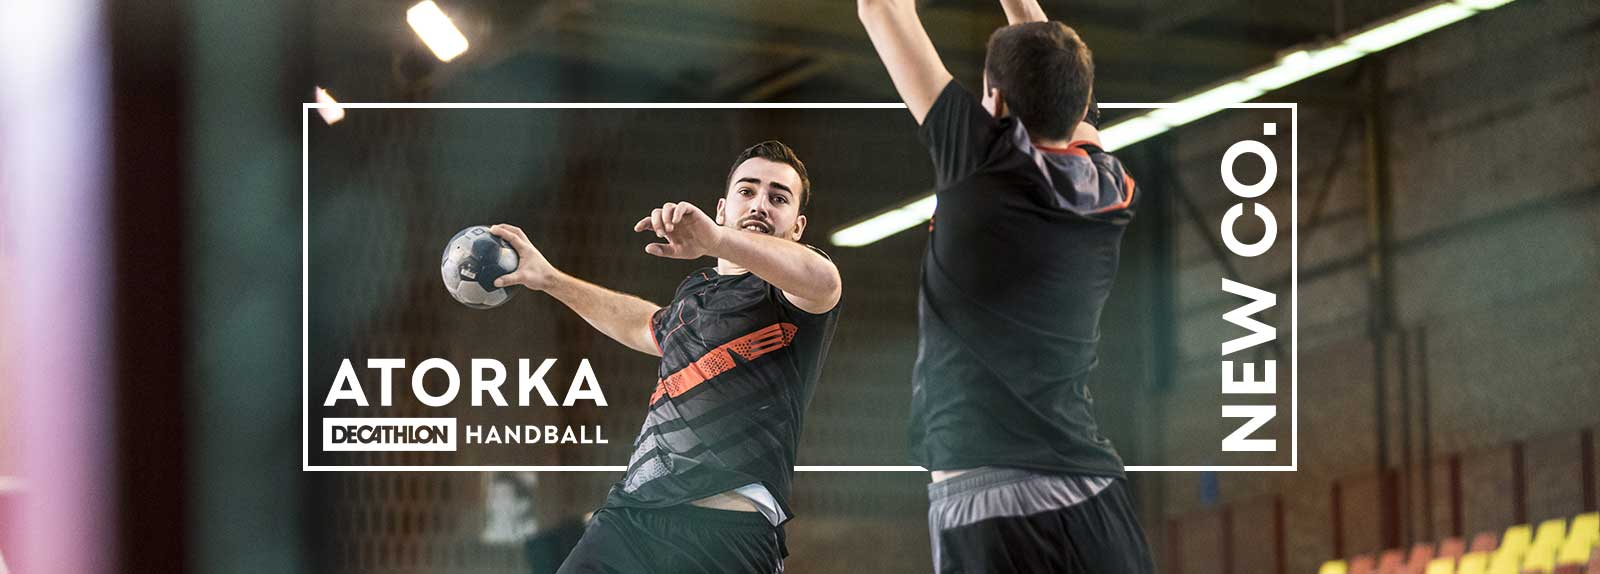 New co ballons Atorka